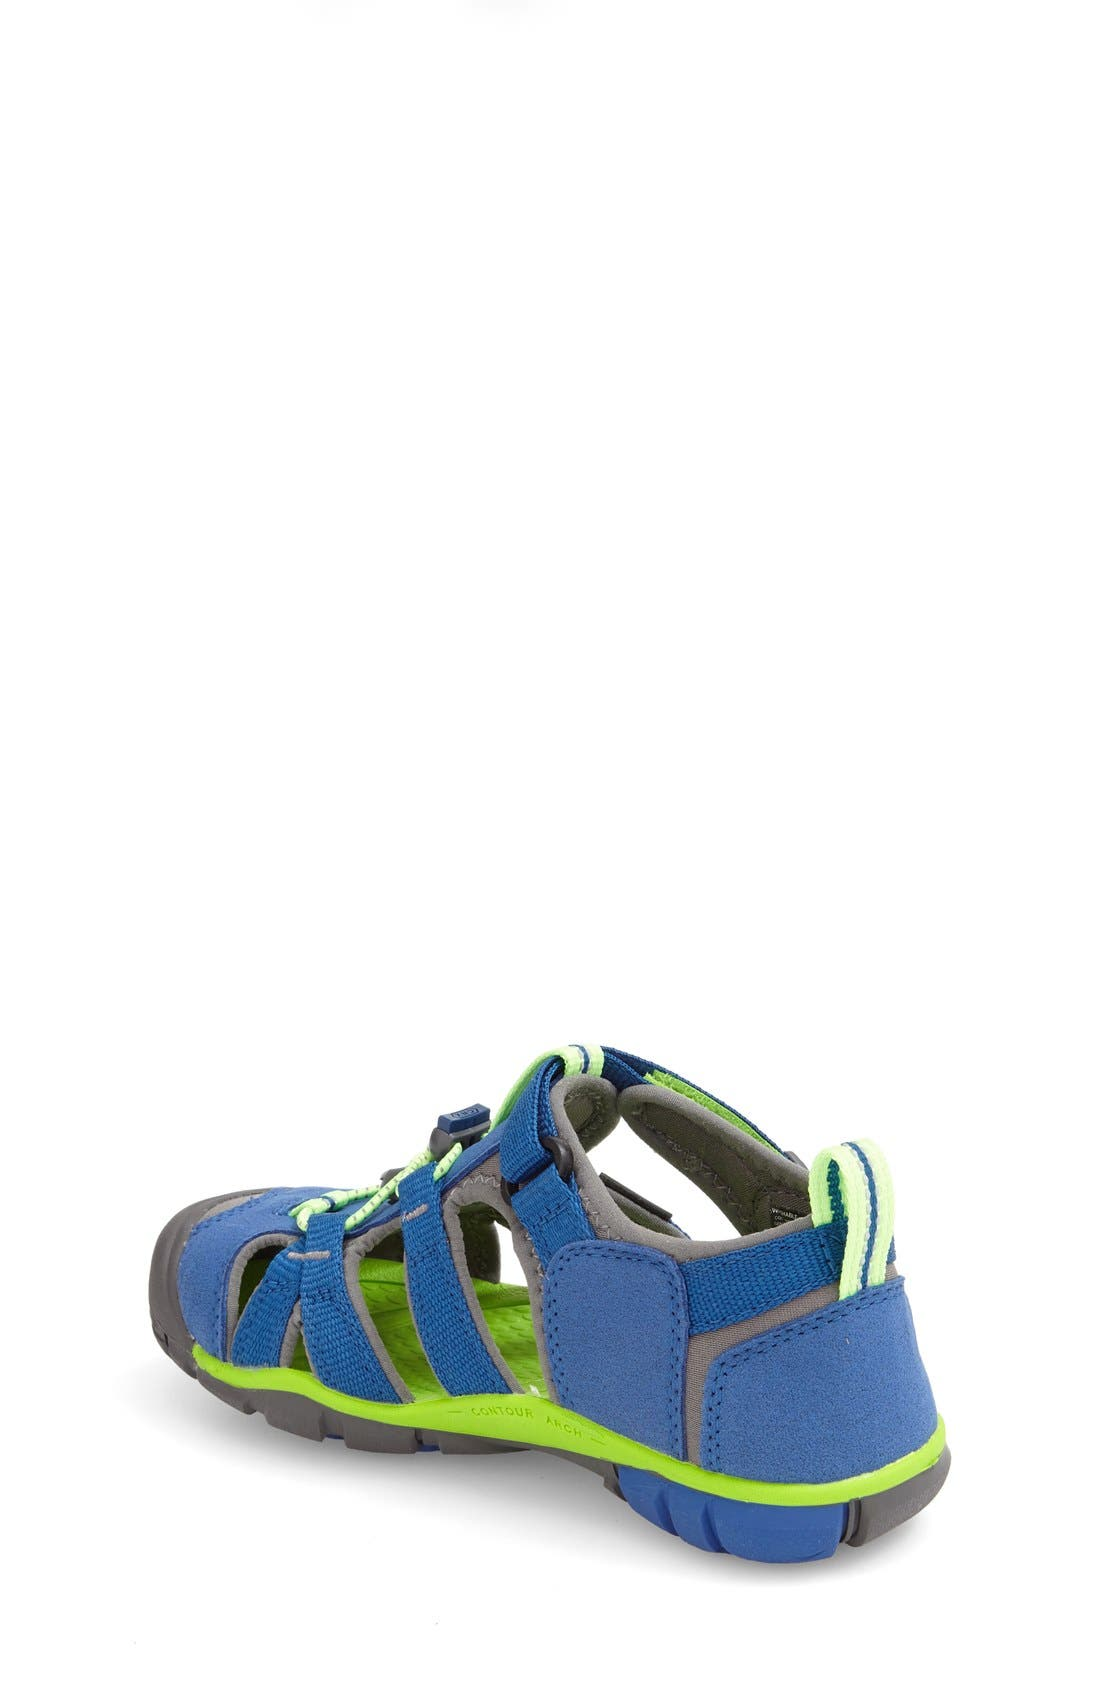 ,                             'Seacamp II' Water Friendly Sandal,                             Alternate thumbnail 151, color,                             400